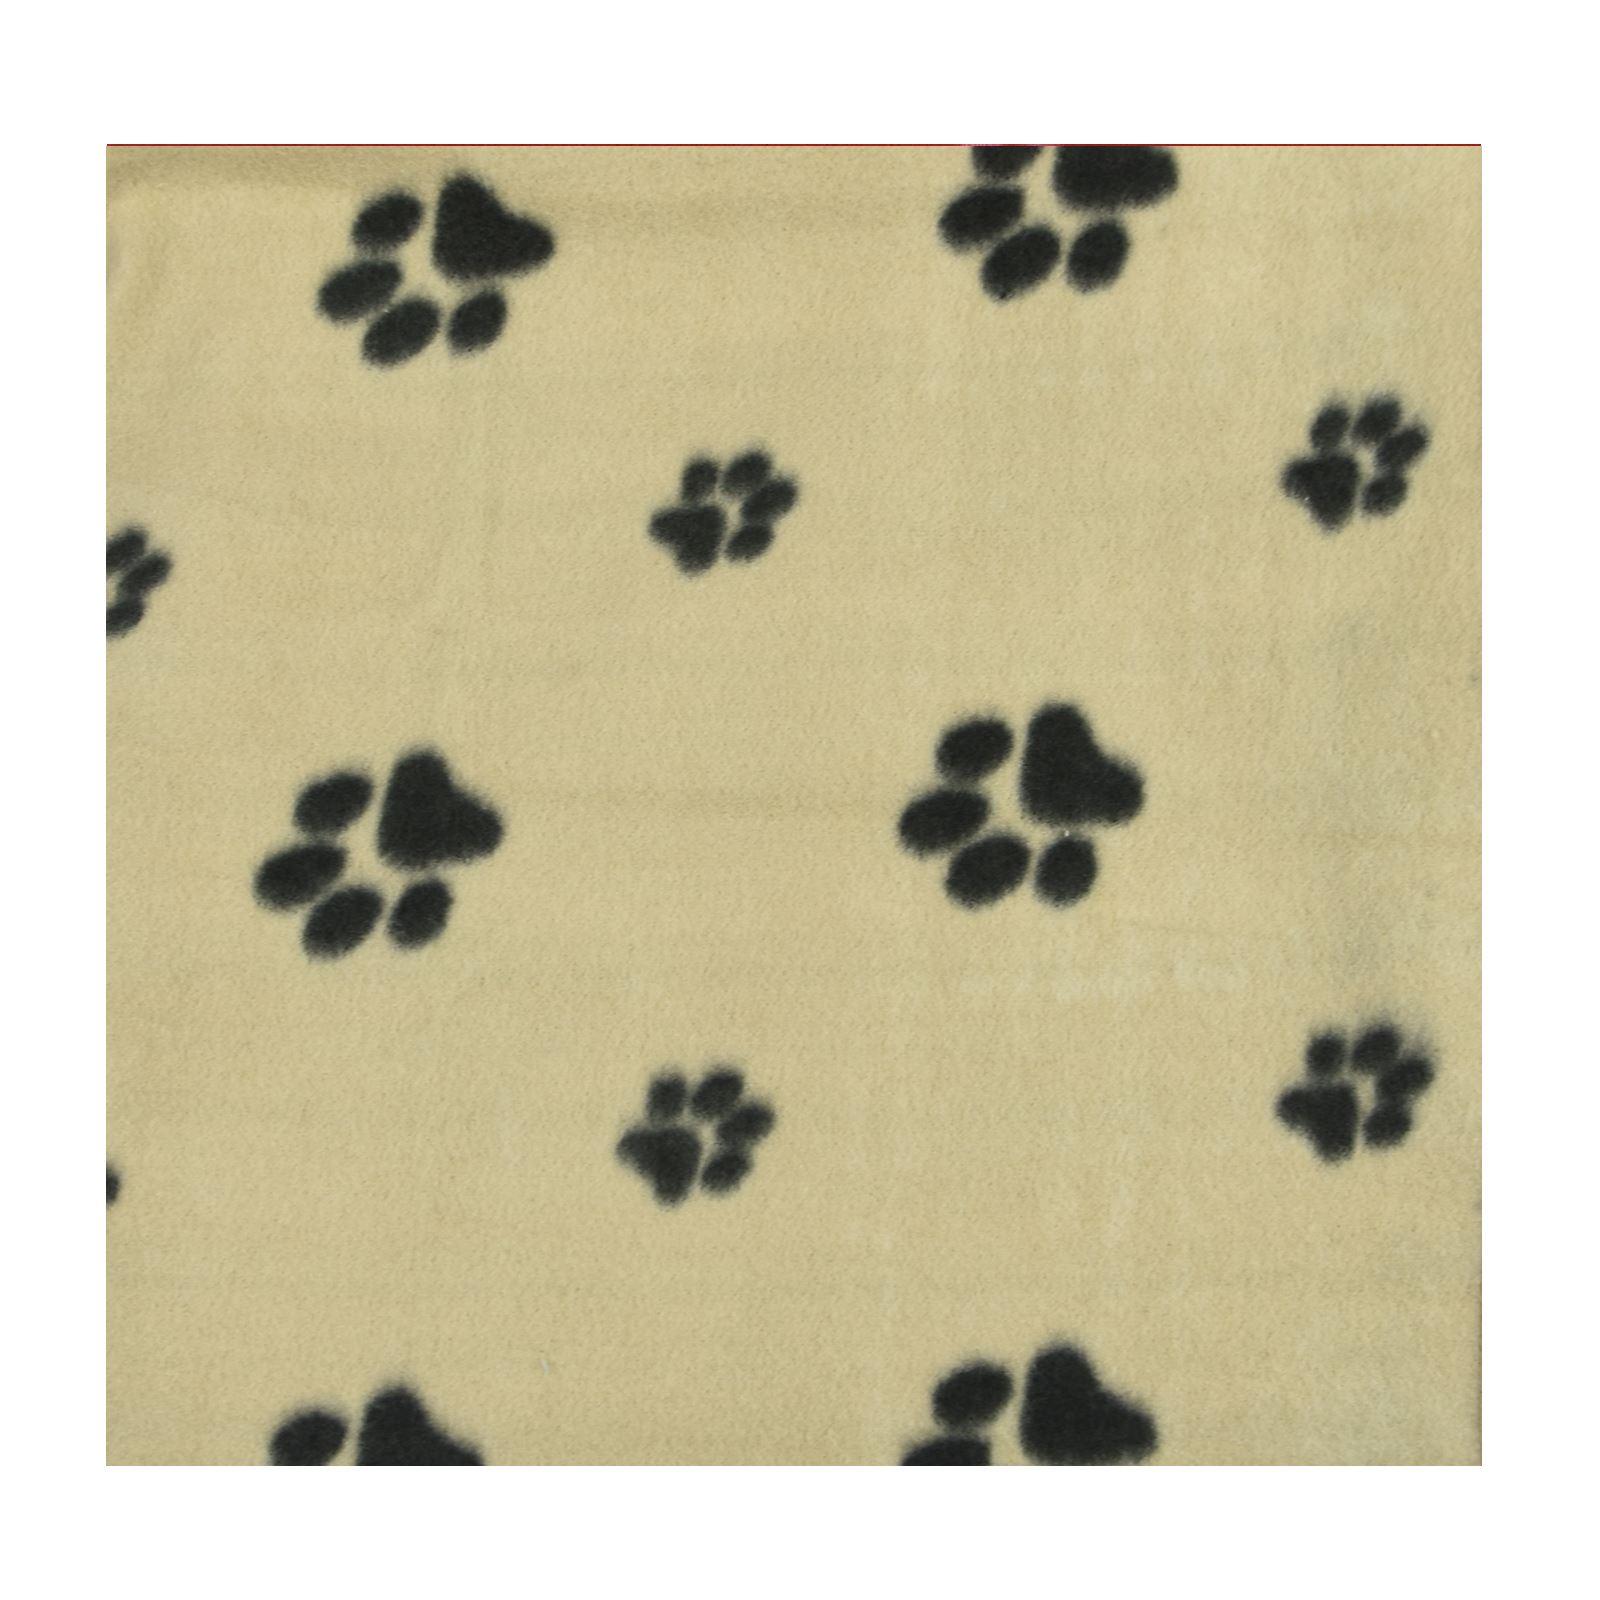 Warm-Pet-Mat-Paw-Print-Cat-Dog-Puppy-Fleece-Soft-Blanket-Bed-Cushion-One-Size thumbnail 3